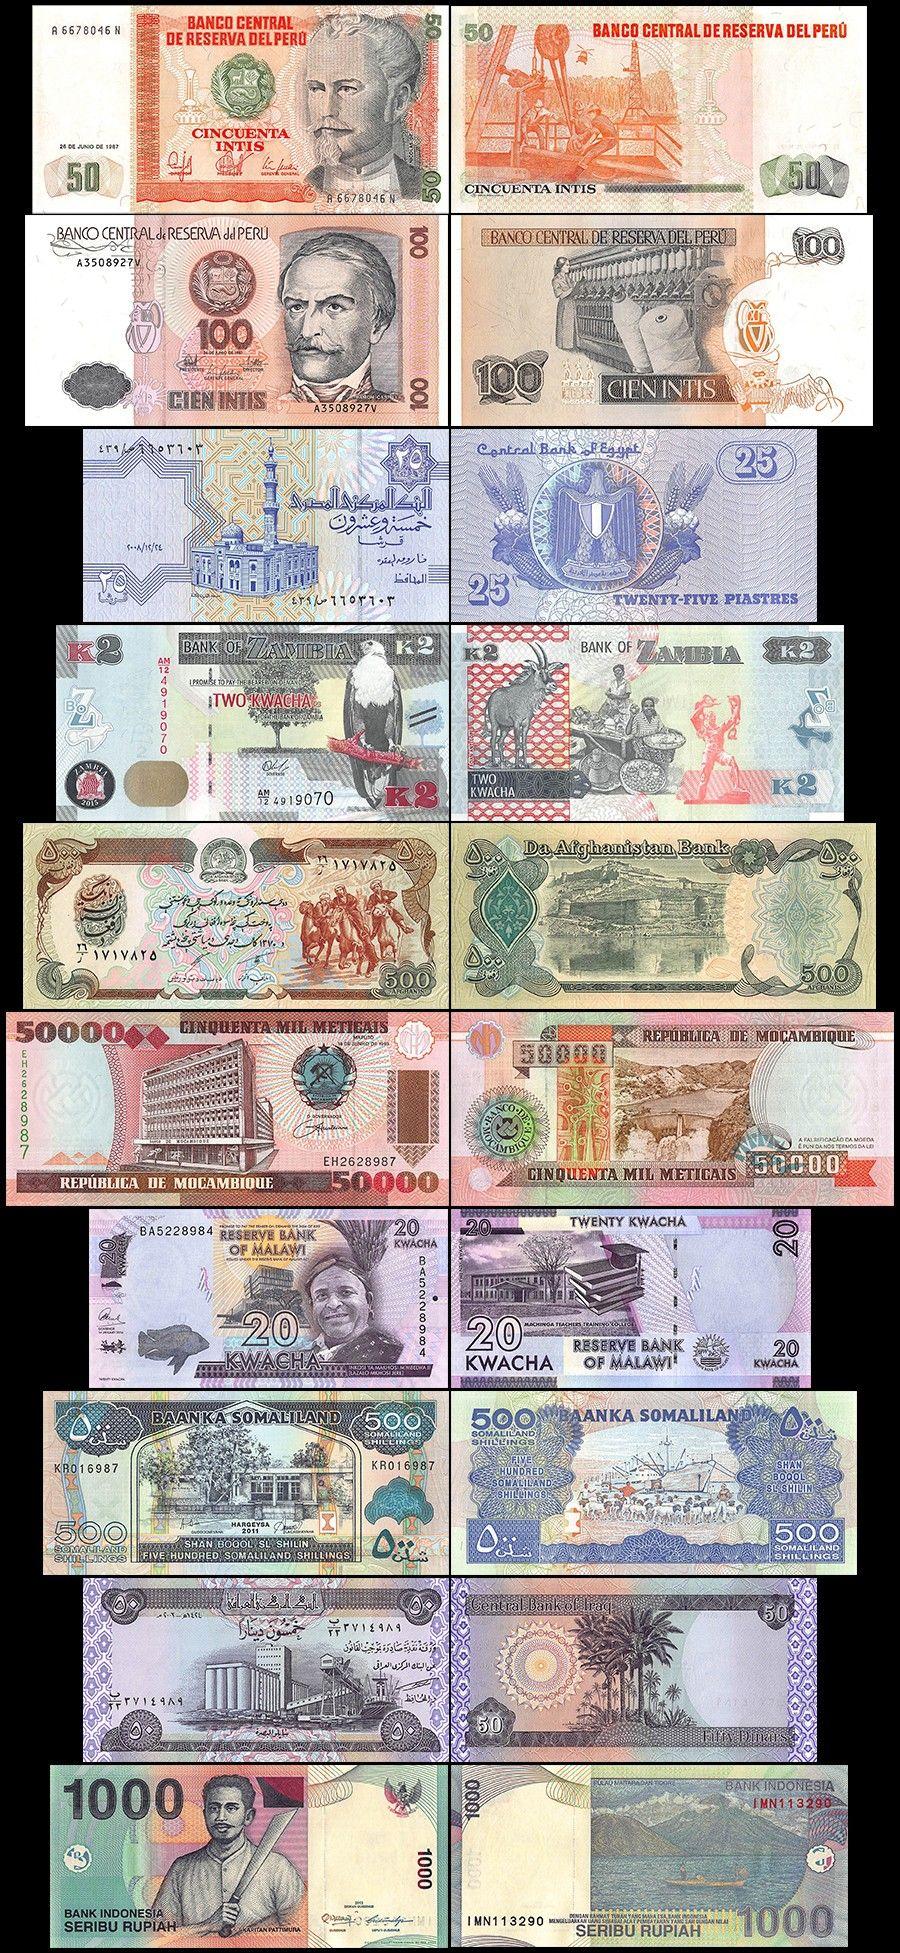 TAJIKISTAN 1000 1,000 Rubles X 5 PCS 1994 P-9 1//20 Bundle UNC